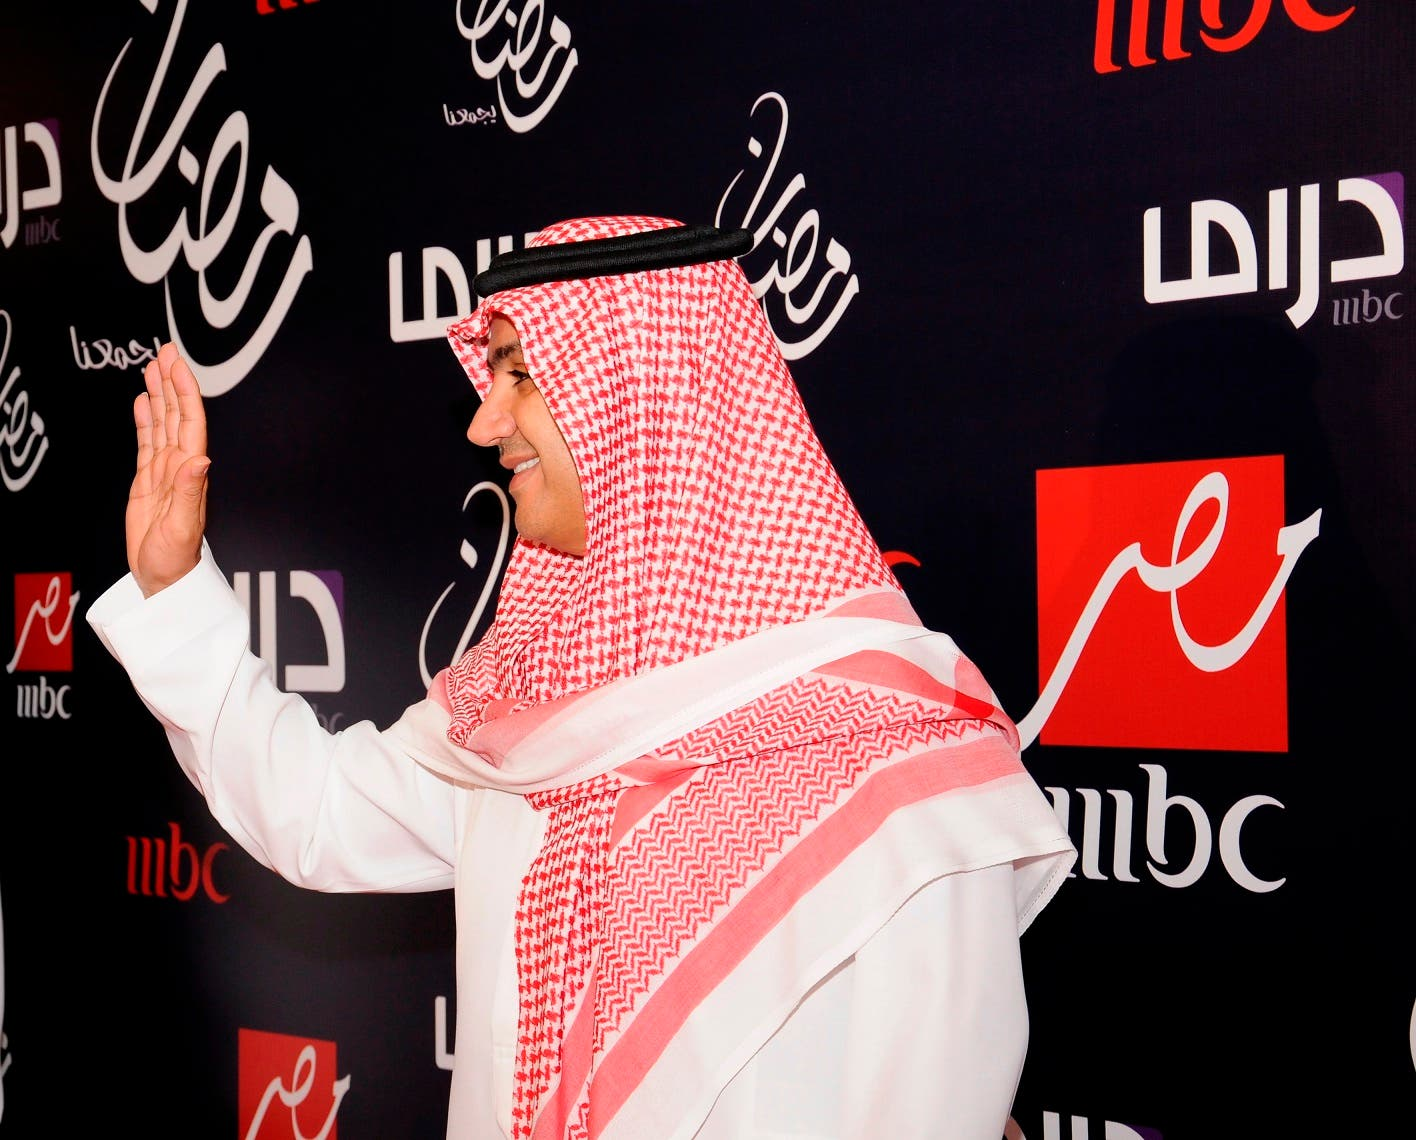 MBC Group Chairman Skeikh Waleed Alibrahim